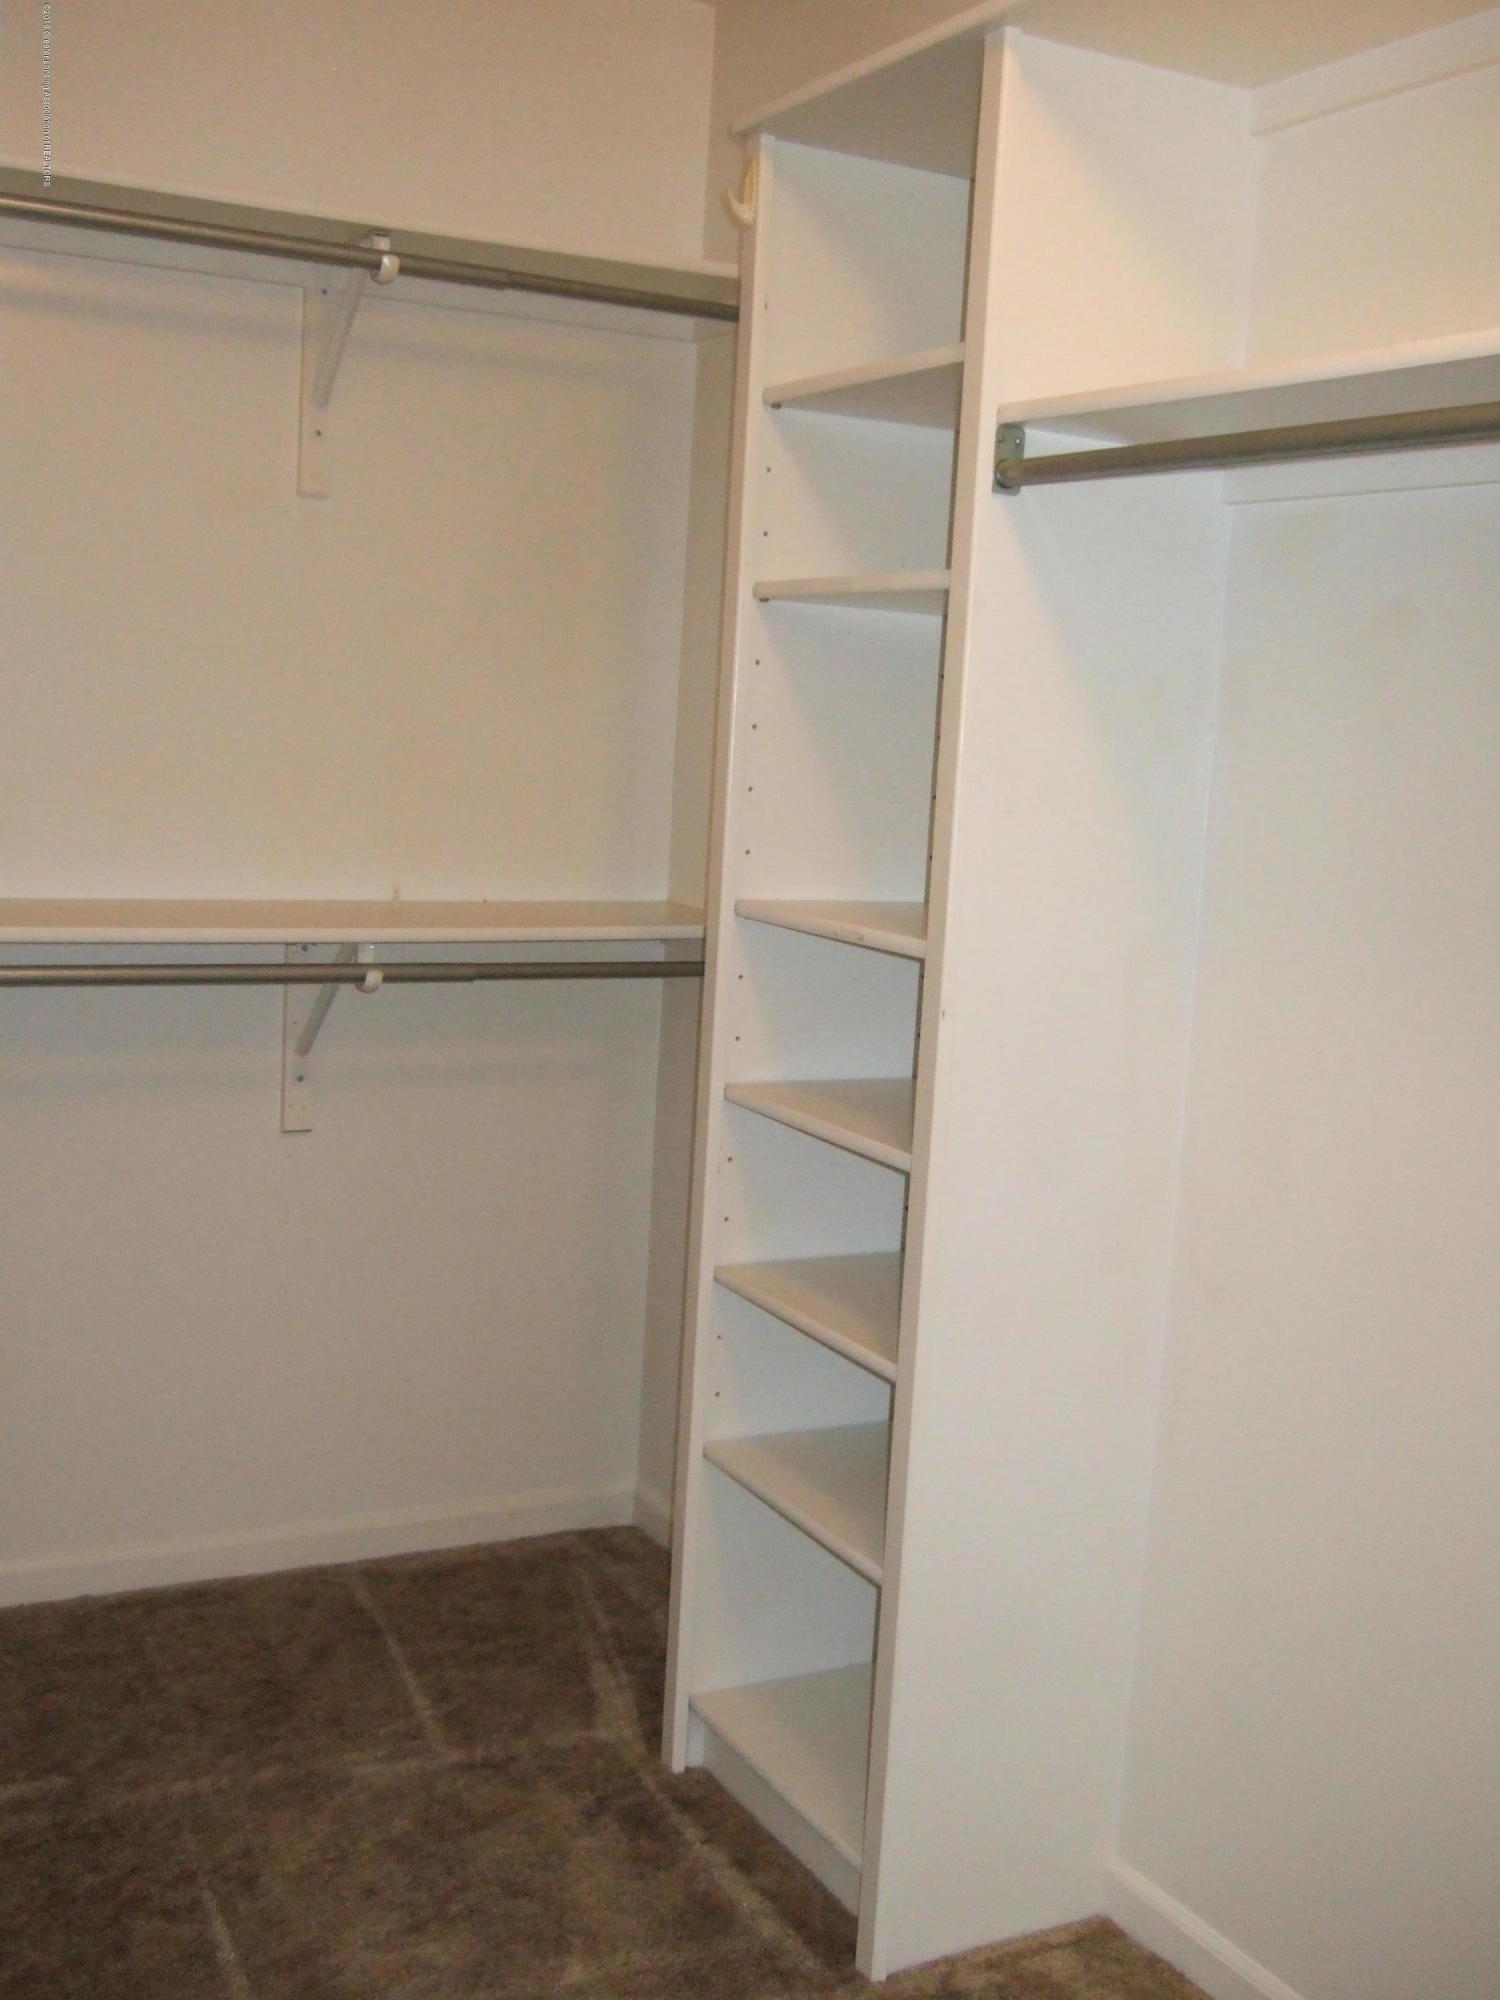 881 Sandview Dr 26 - Master Bedroom Walk in Closet - 14